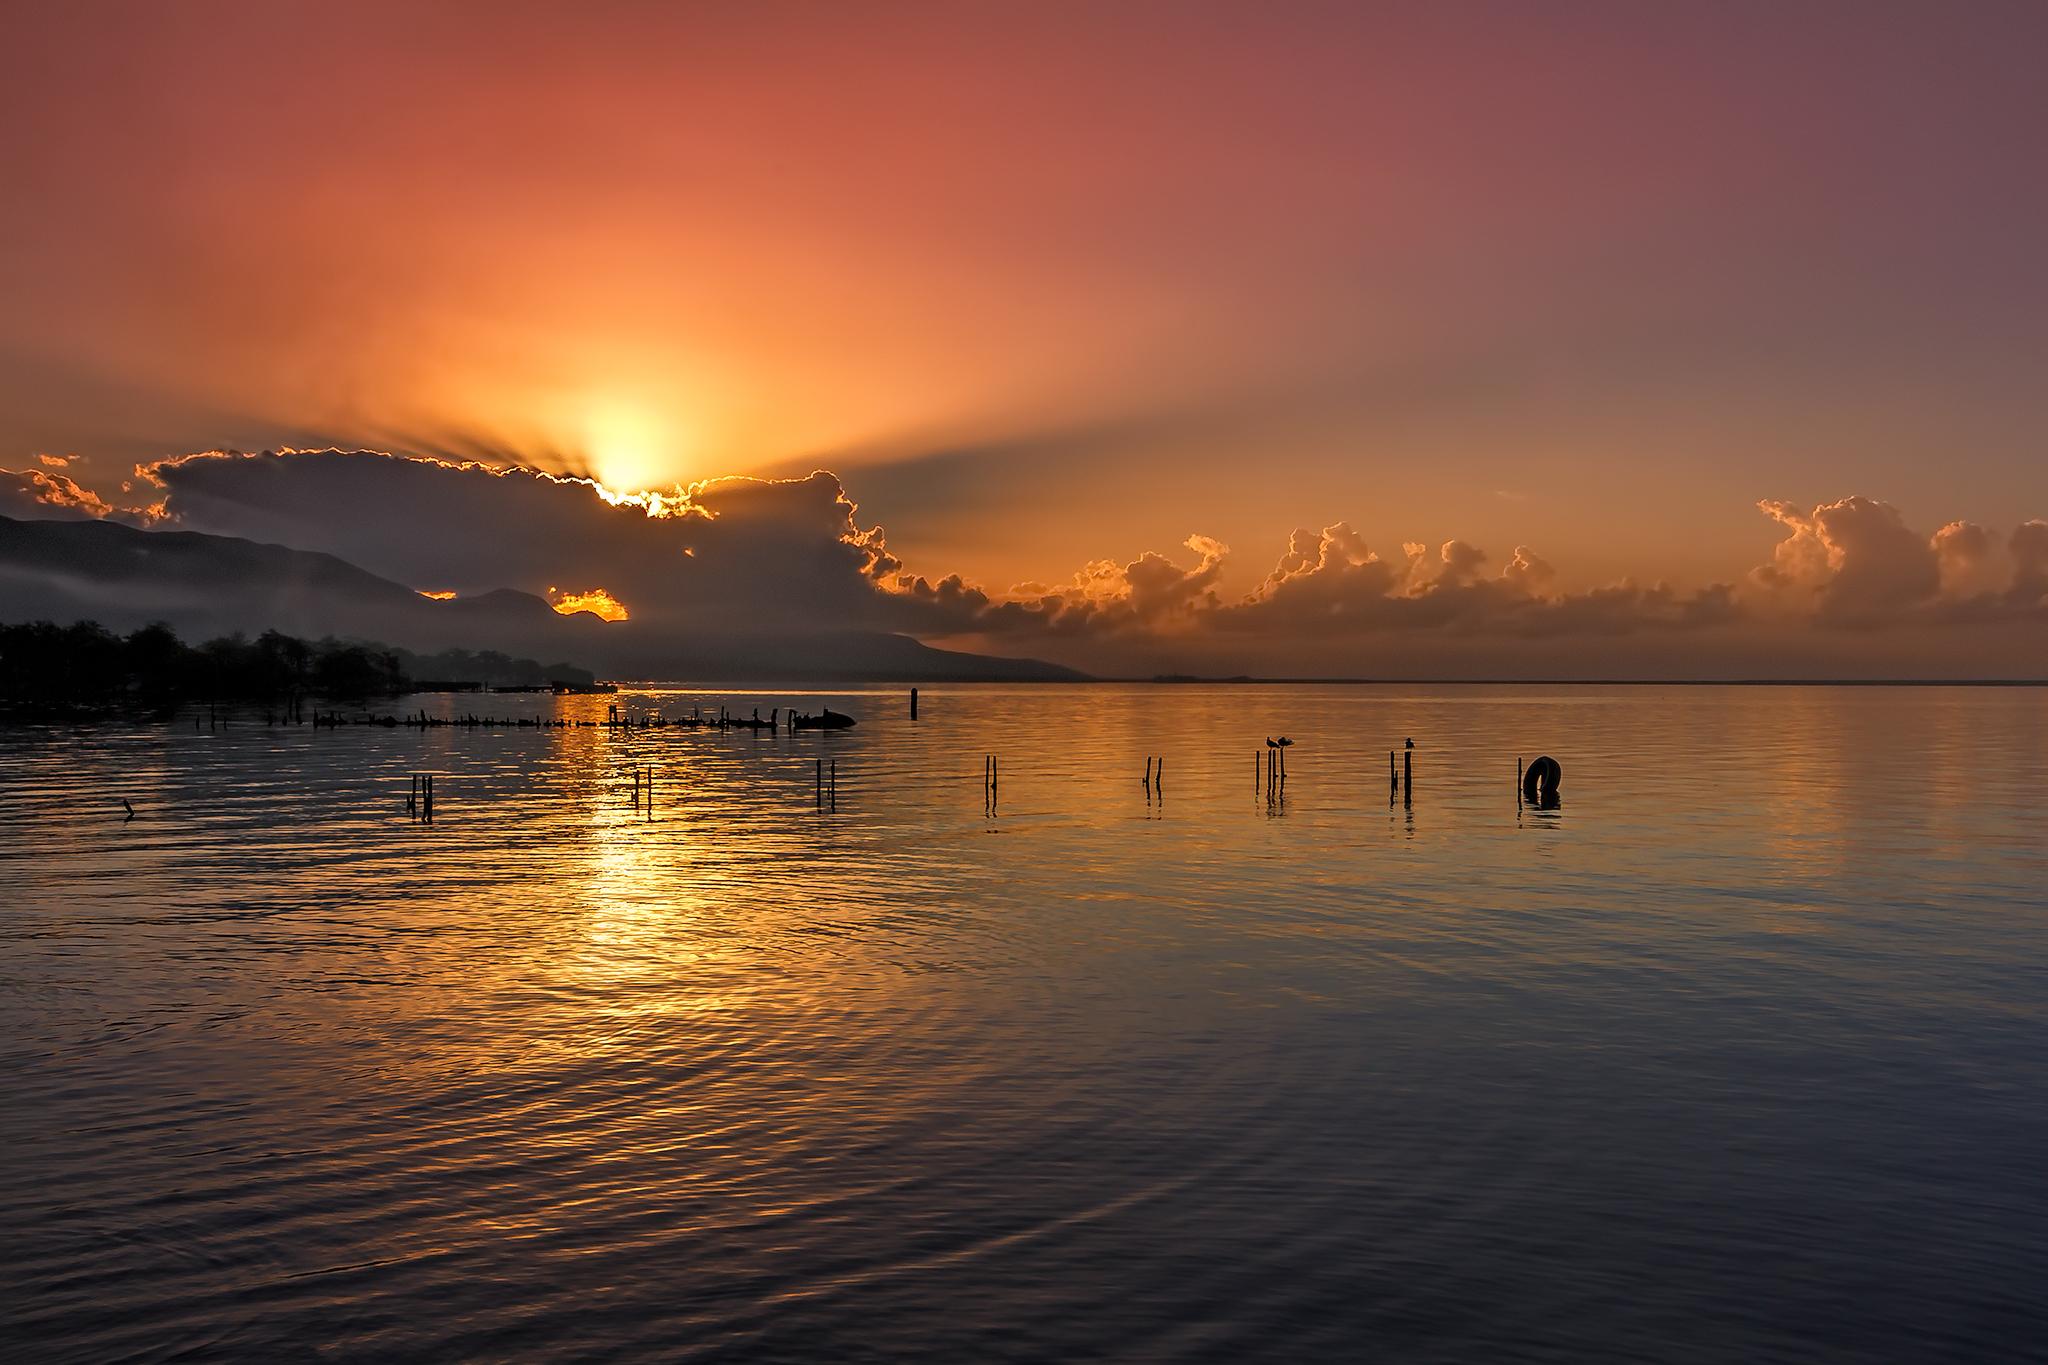 Sunrise in East Kingston, Jamaica